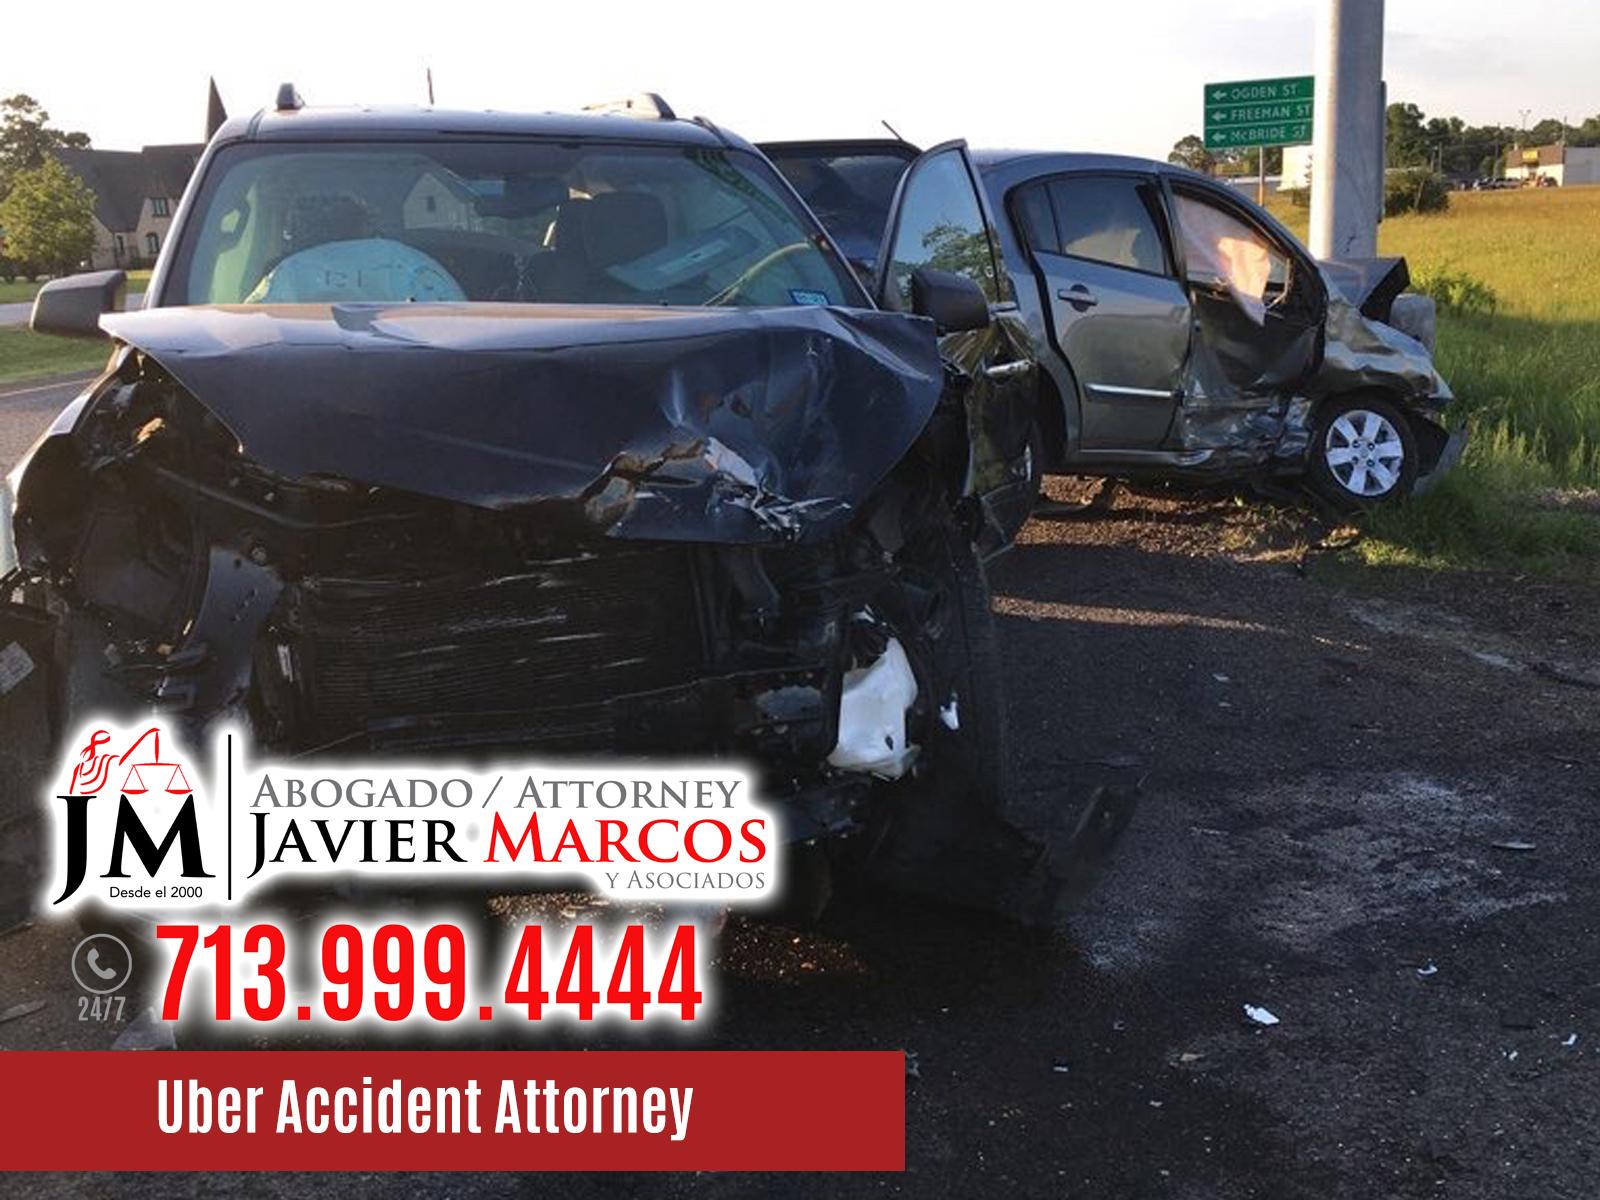 Uber Accident Attorney   Attorney Javier Marcos   713.999.4444